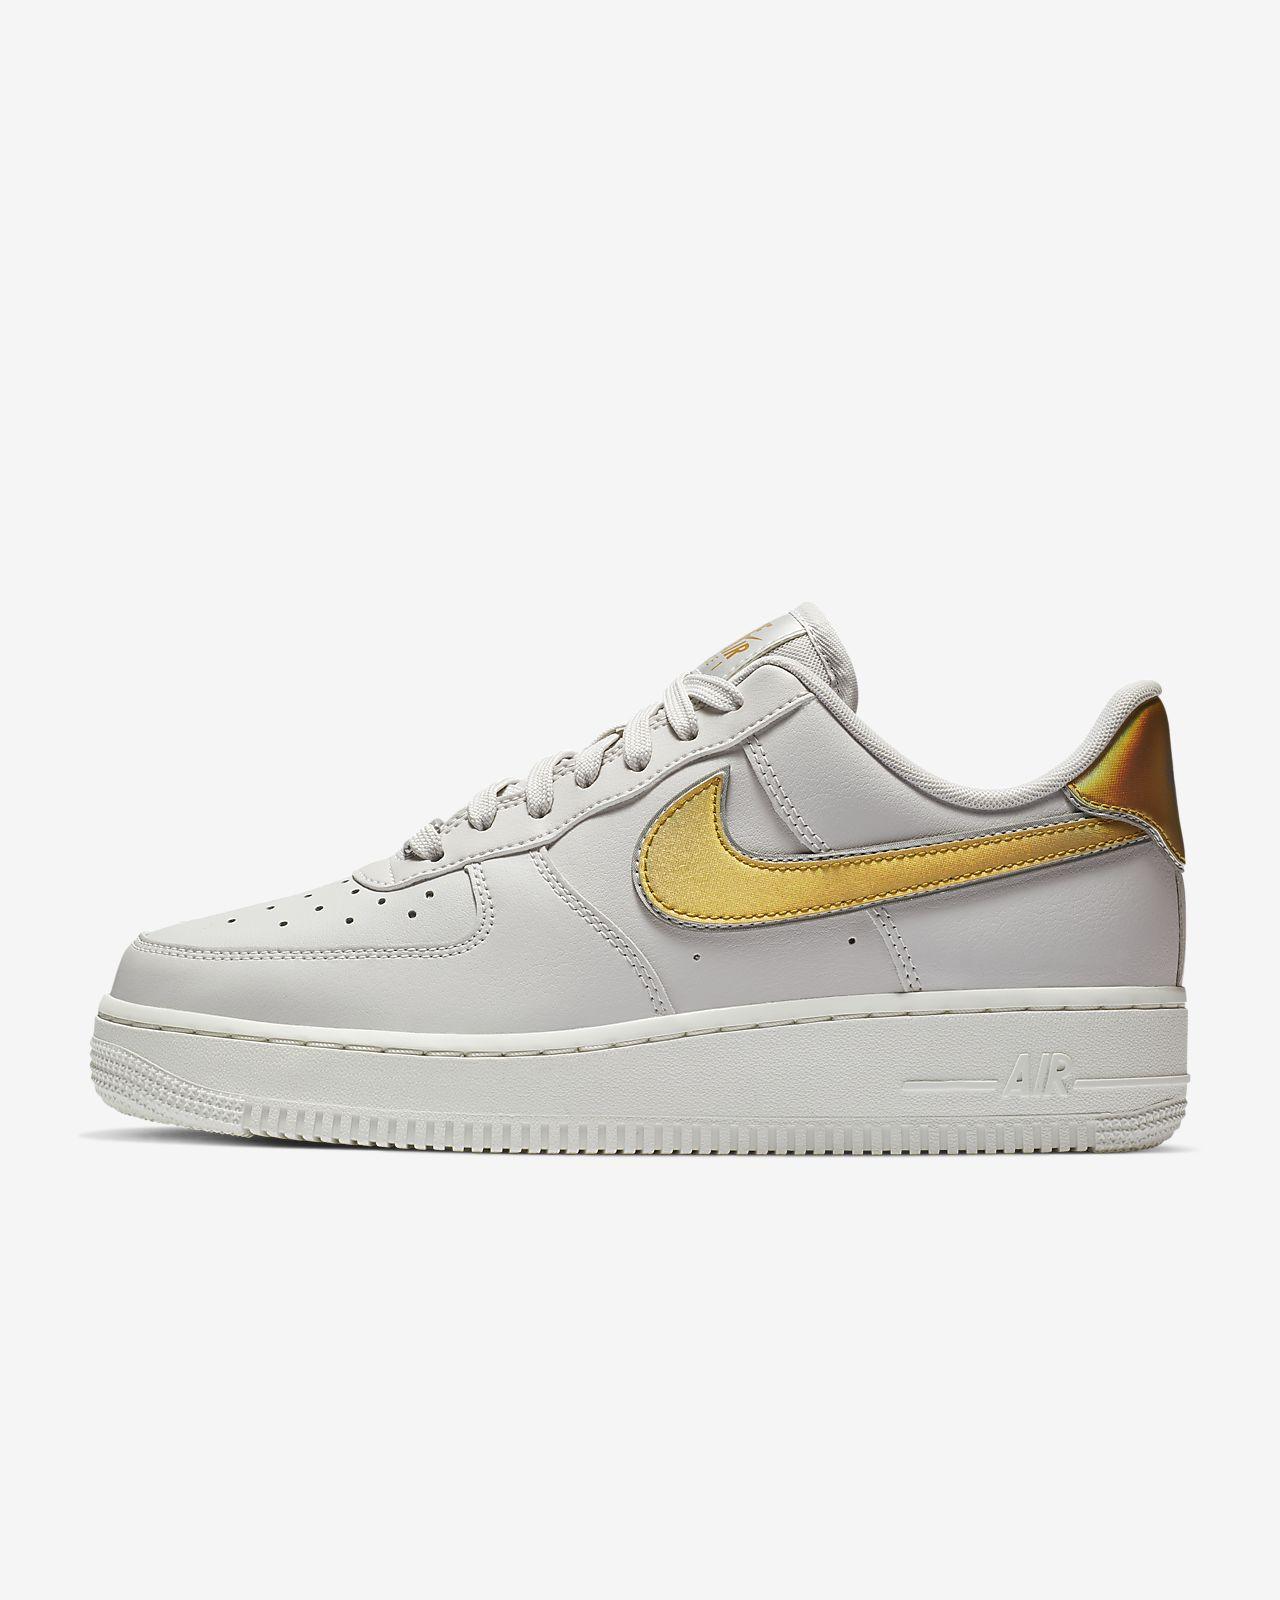 edaa3896d3e488 Nike Air Force 1  07 Metallic Damenschuh. Nike.com DE